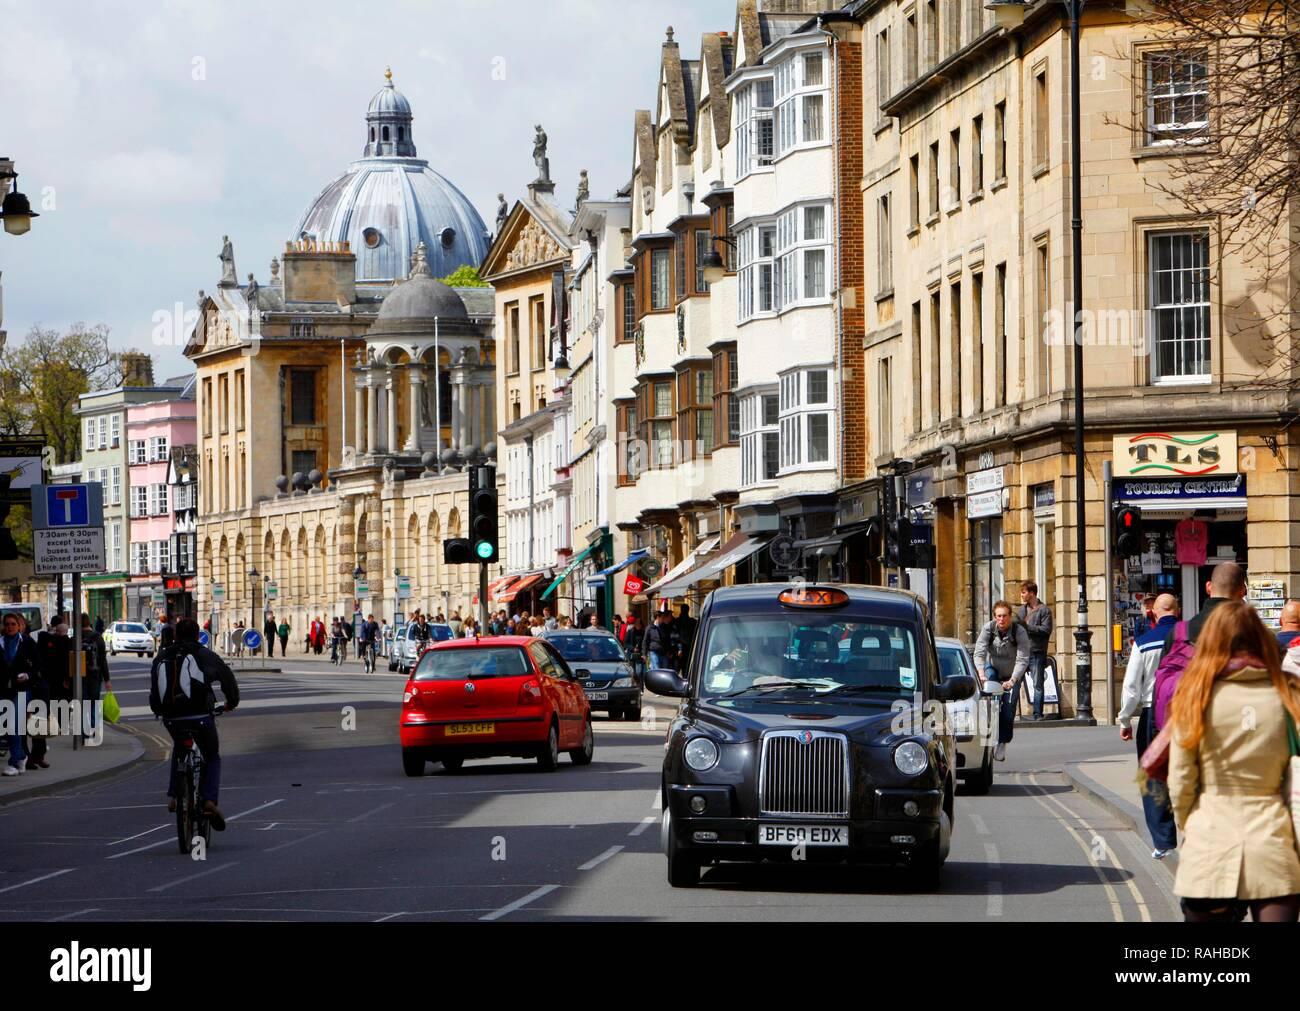 High Street, inner city, Oxford, Oxfordshire, United Kingdom, Europe - Stock Image